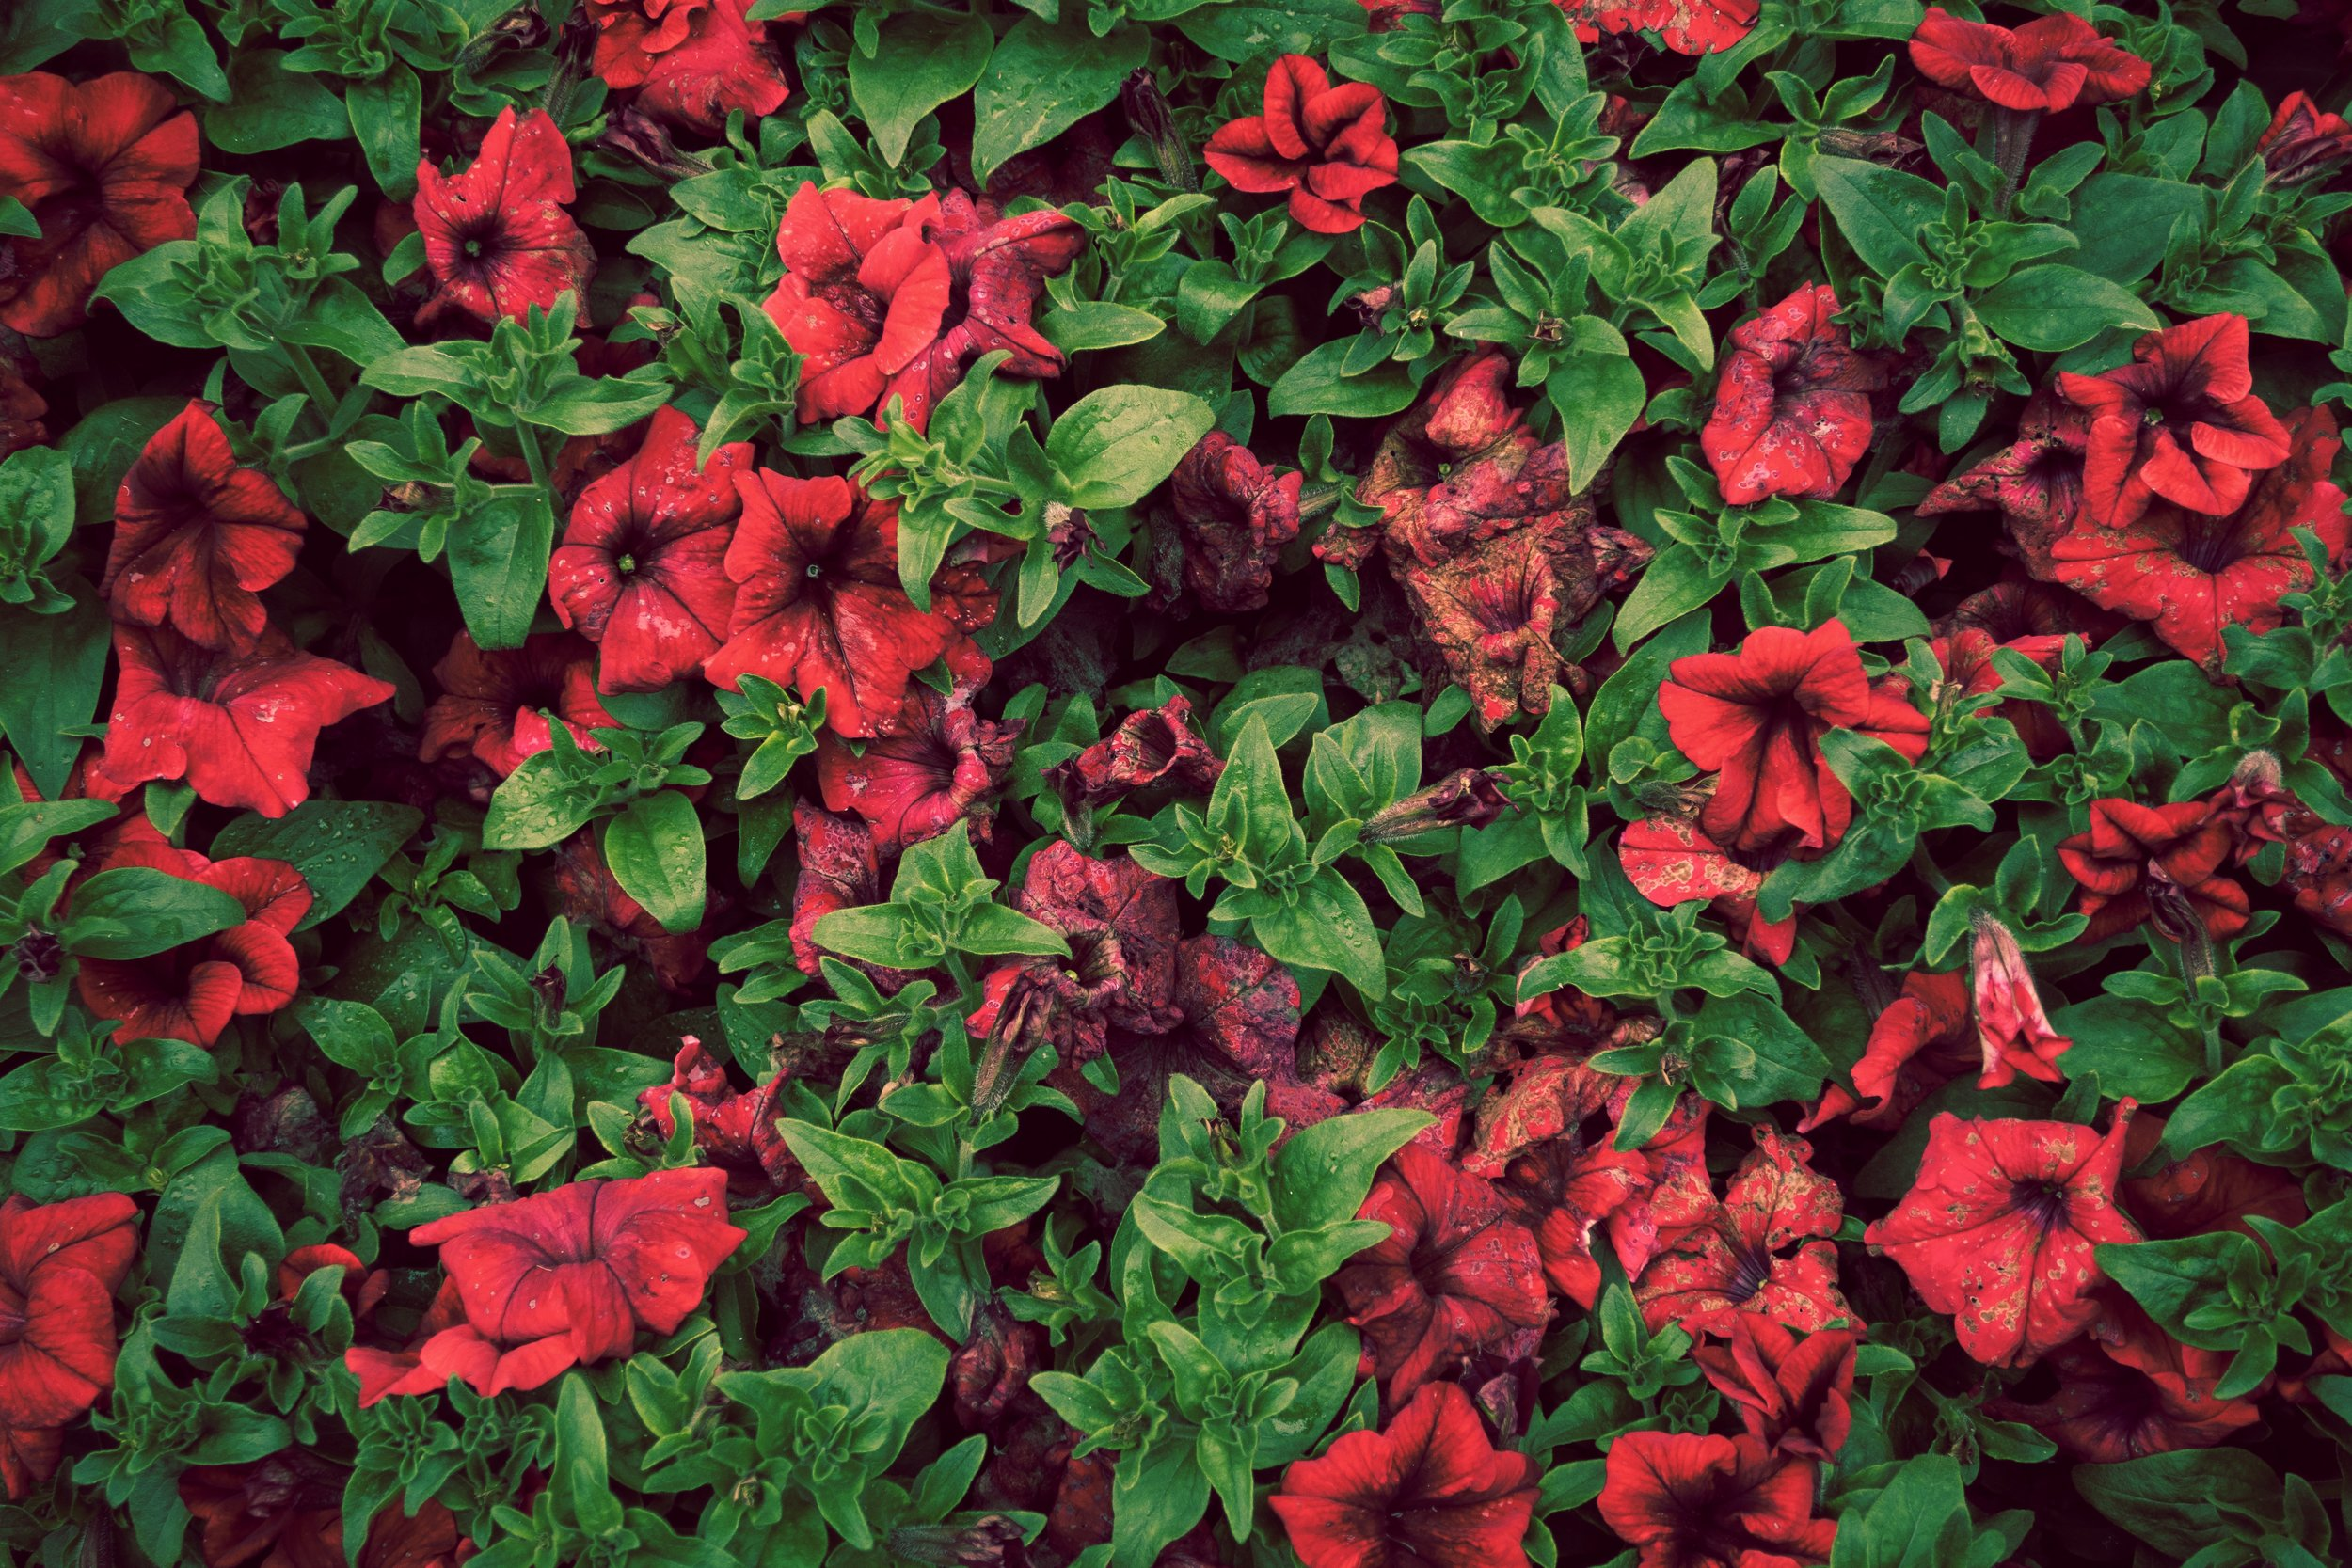 Rotting flowers | G9X Mark II